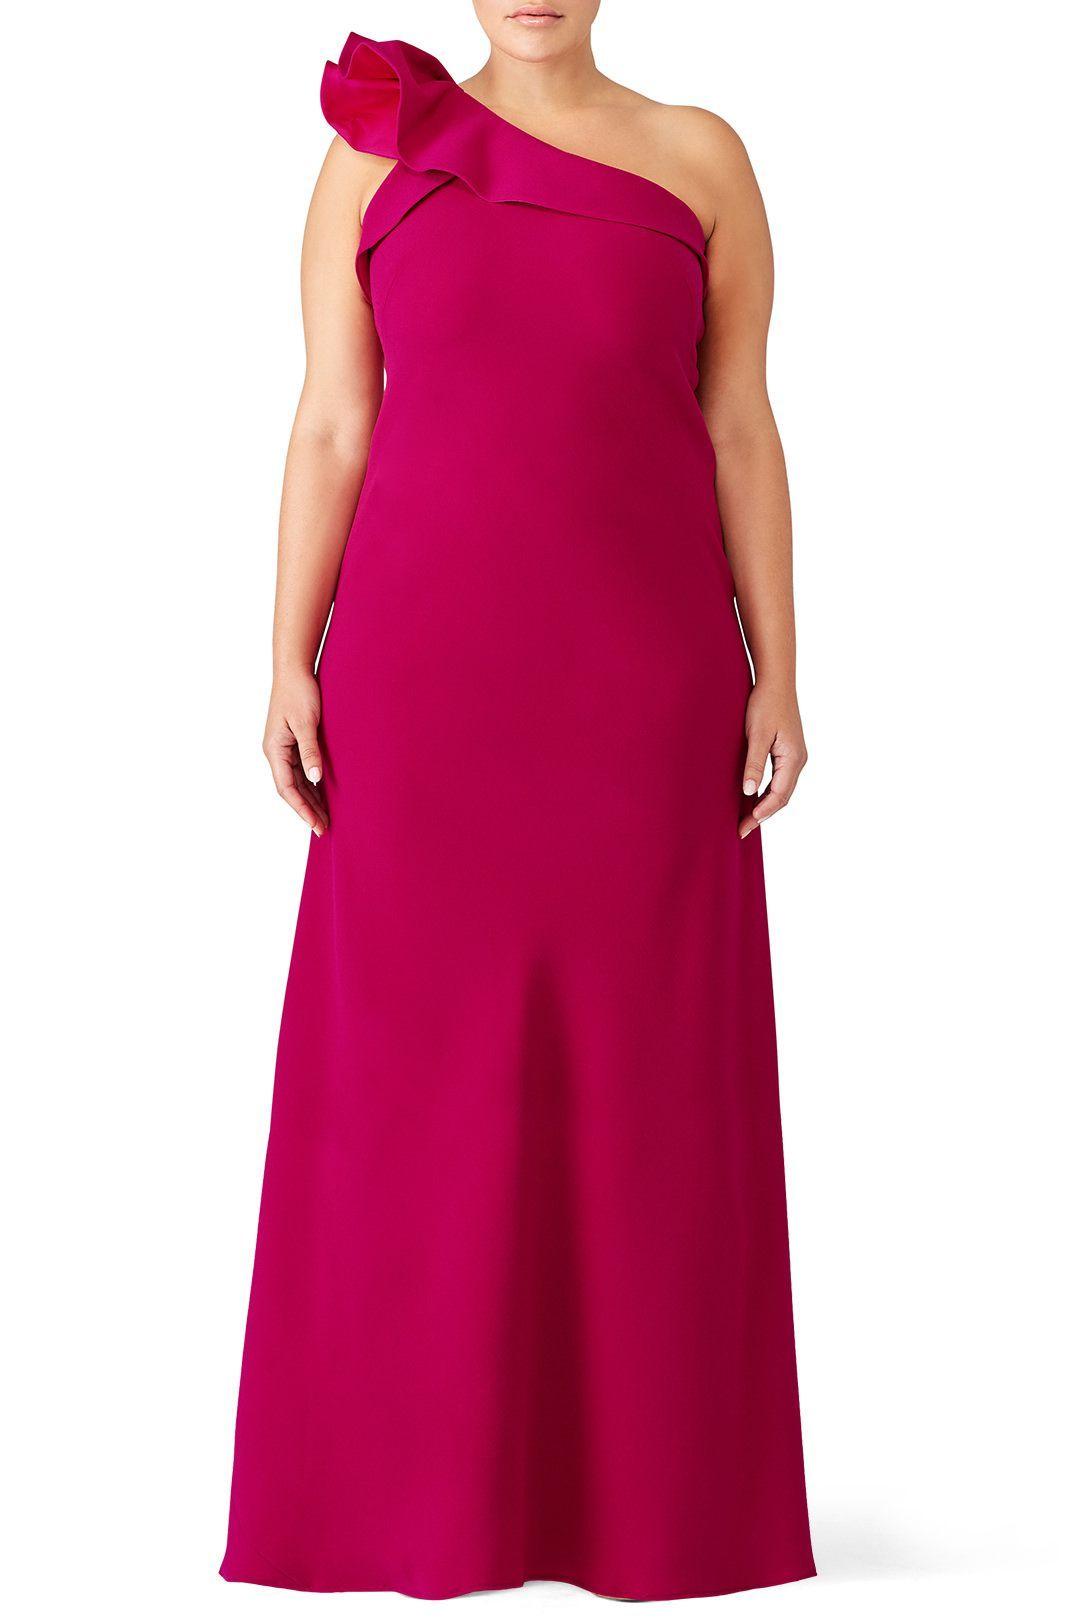 b8e3c9b9265 Prom Dress Rental - Where to Rent Prom Dresses for Under $200